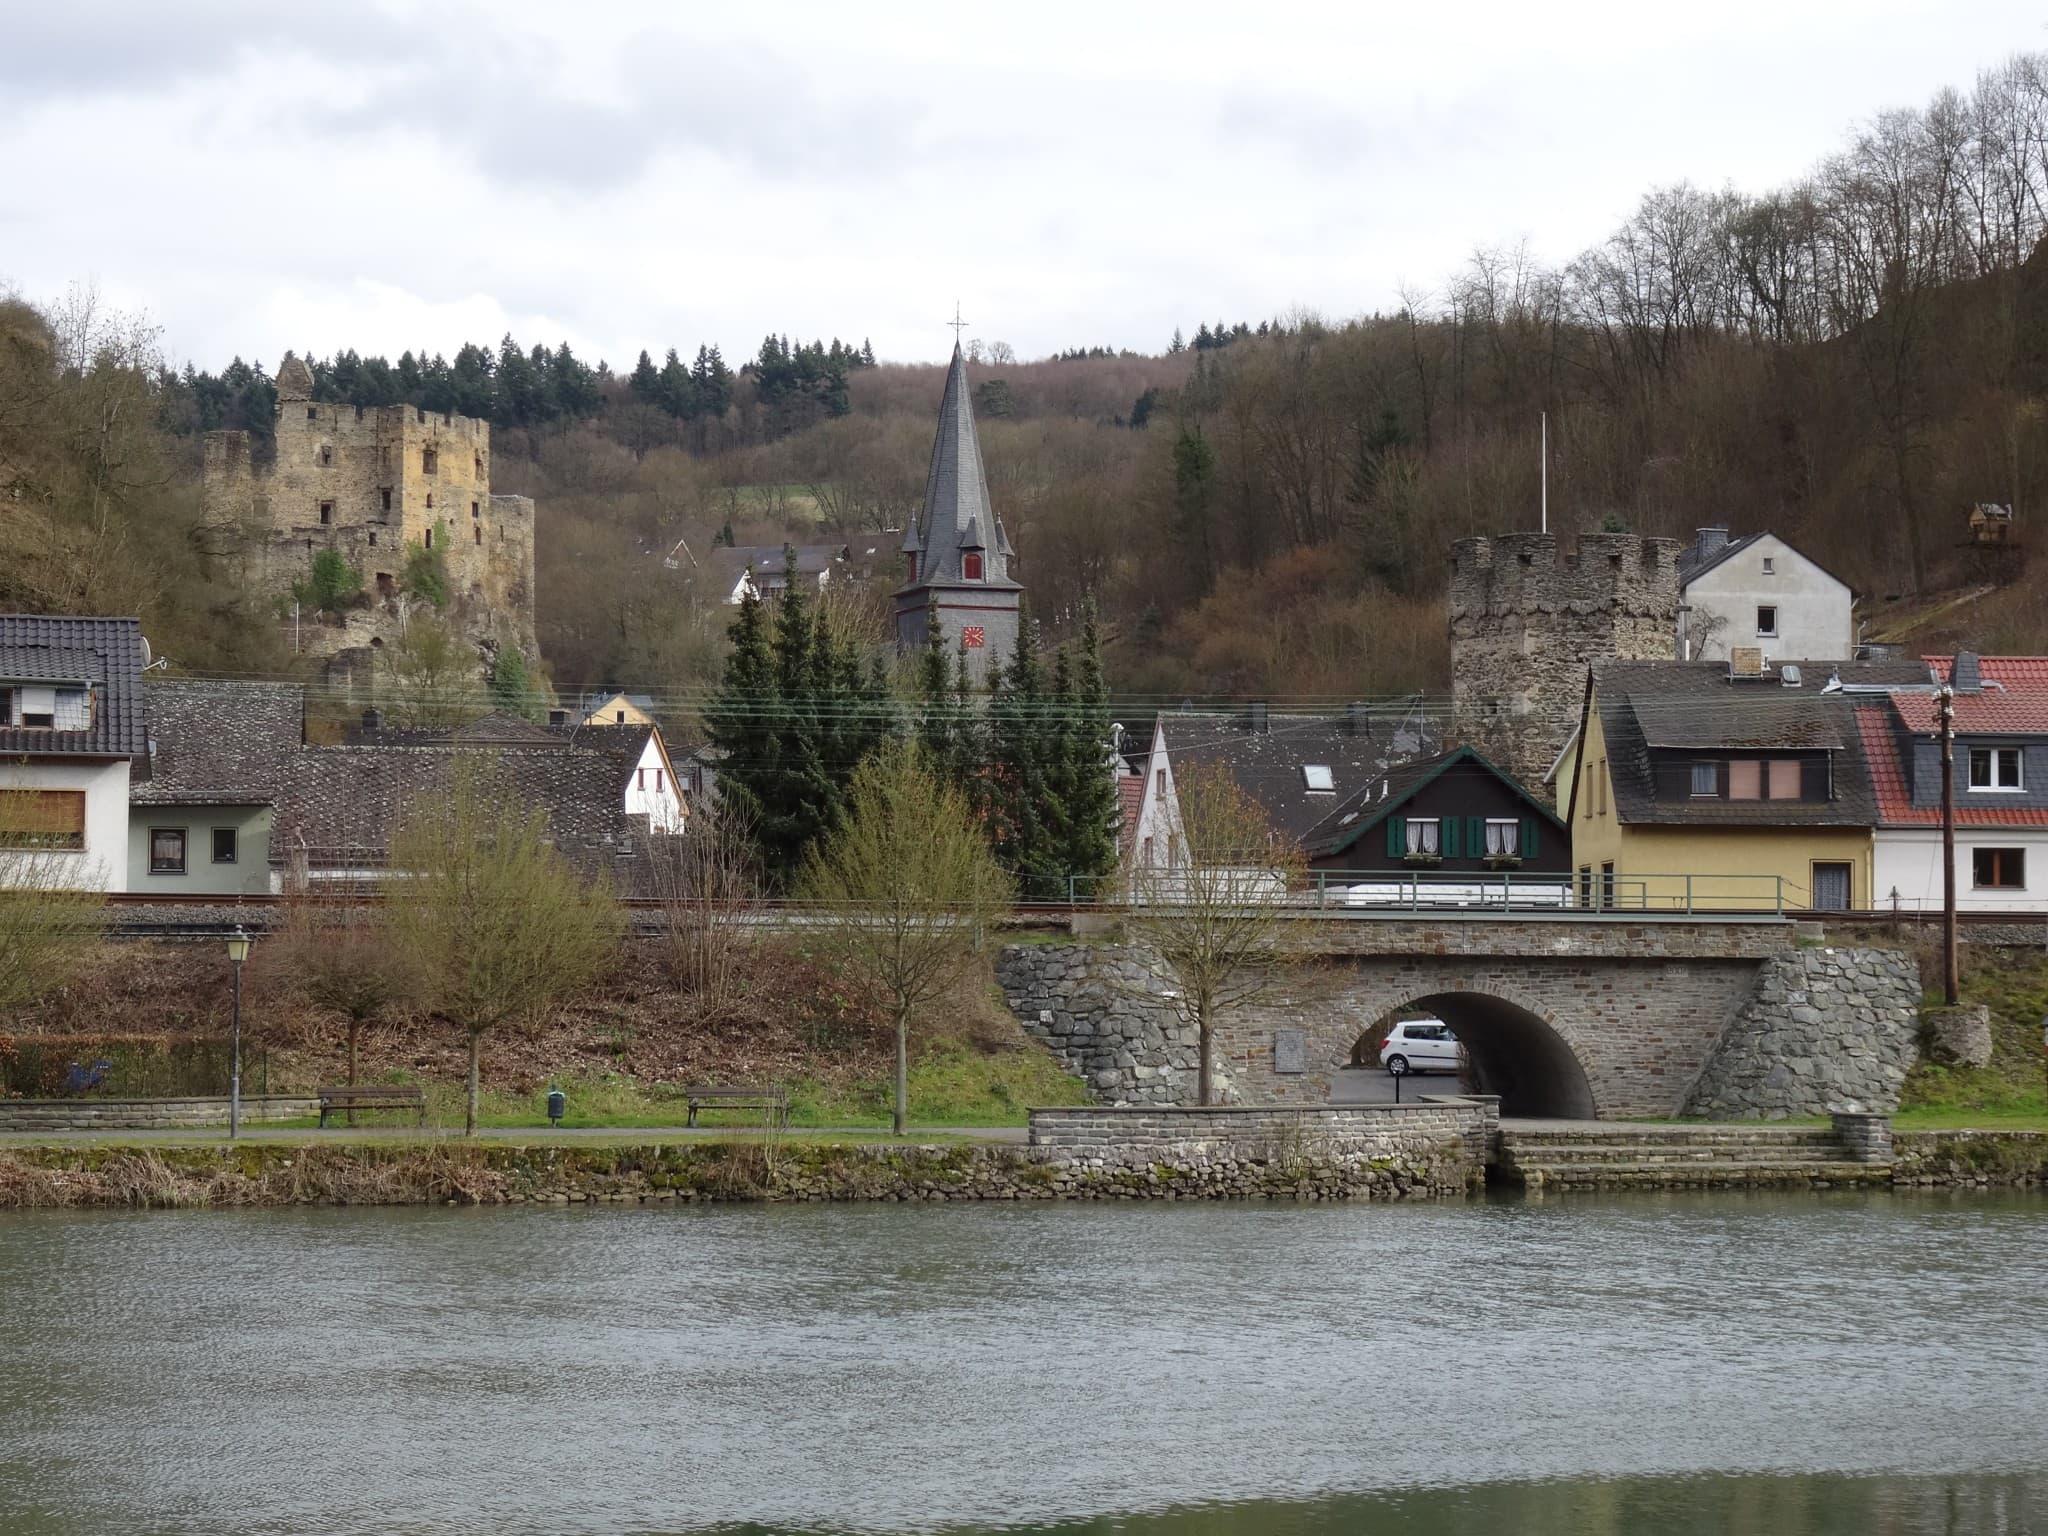 Germany - Balduinstein